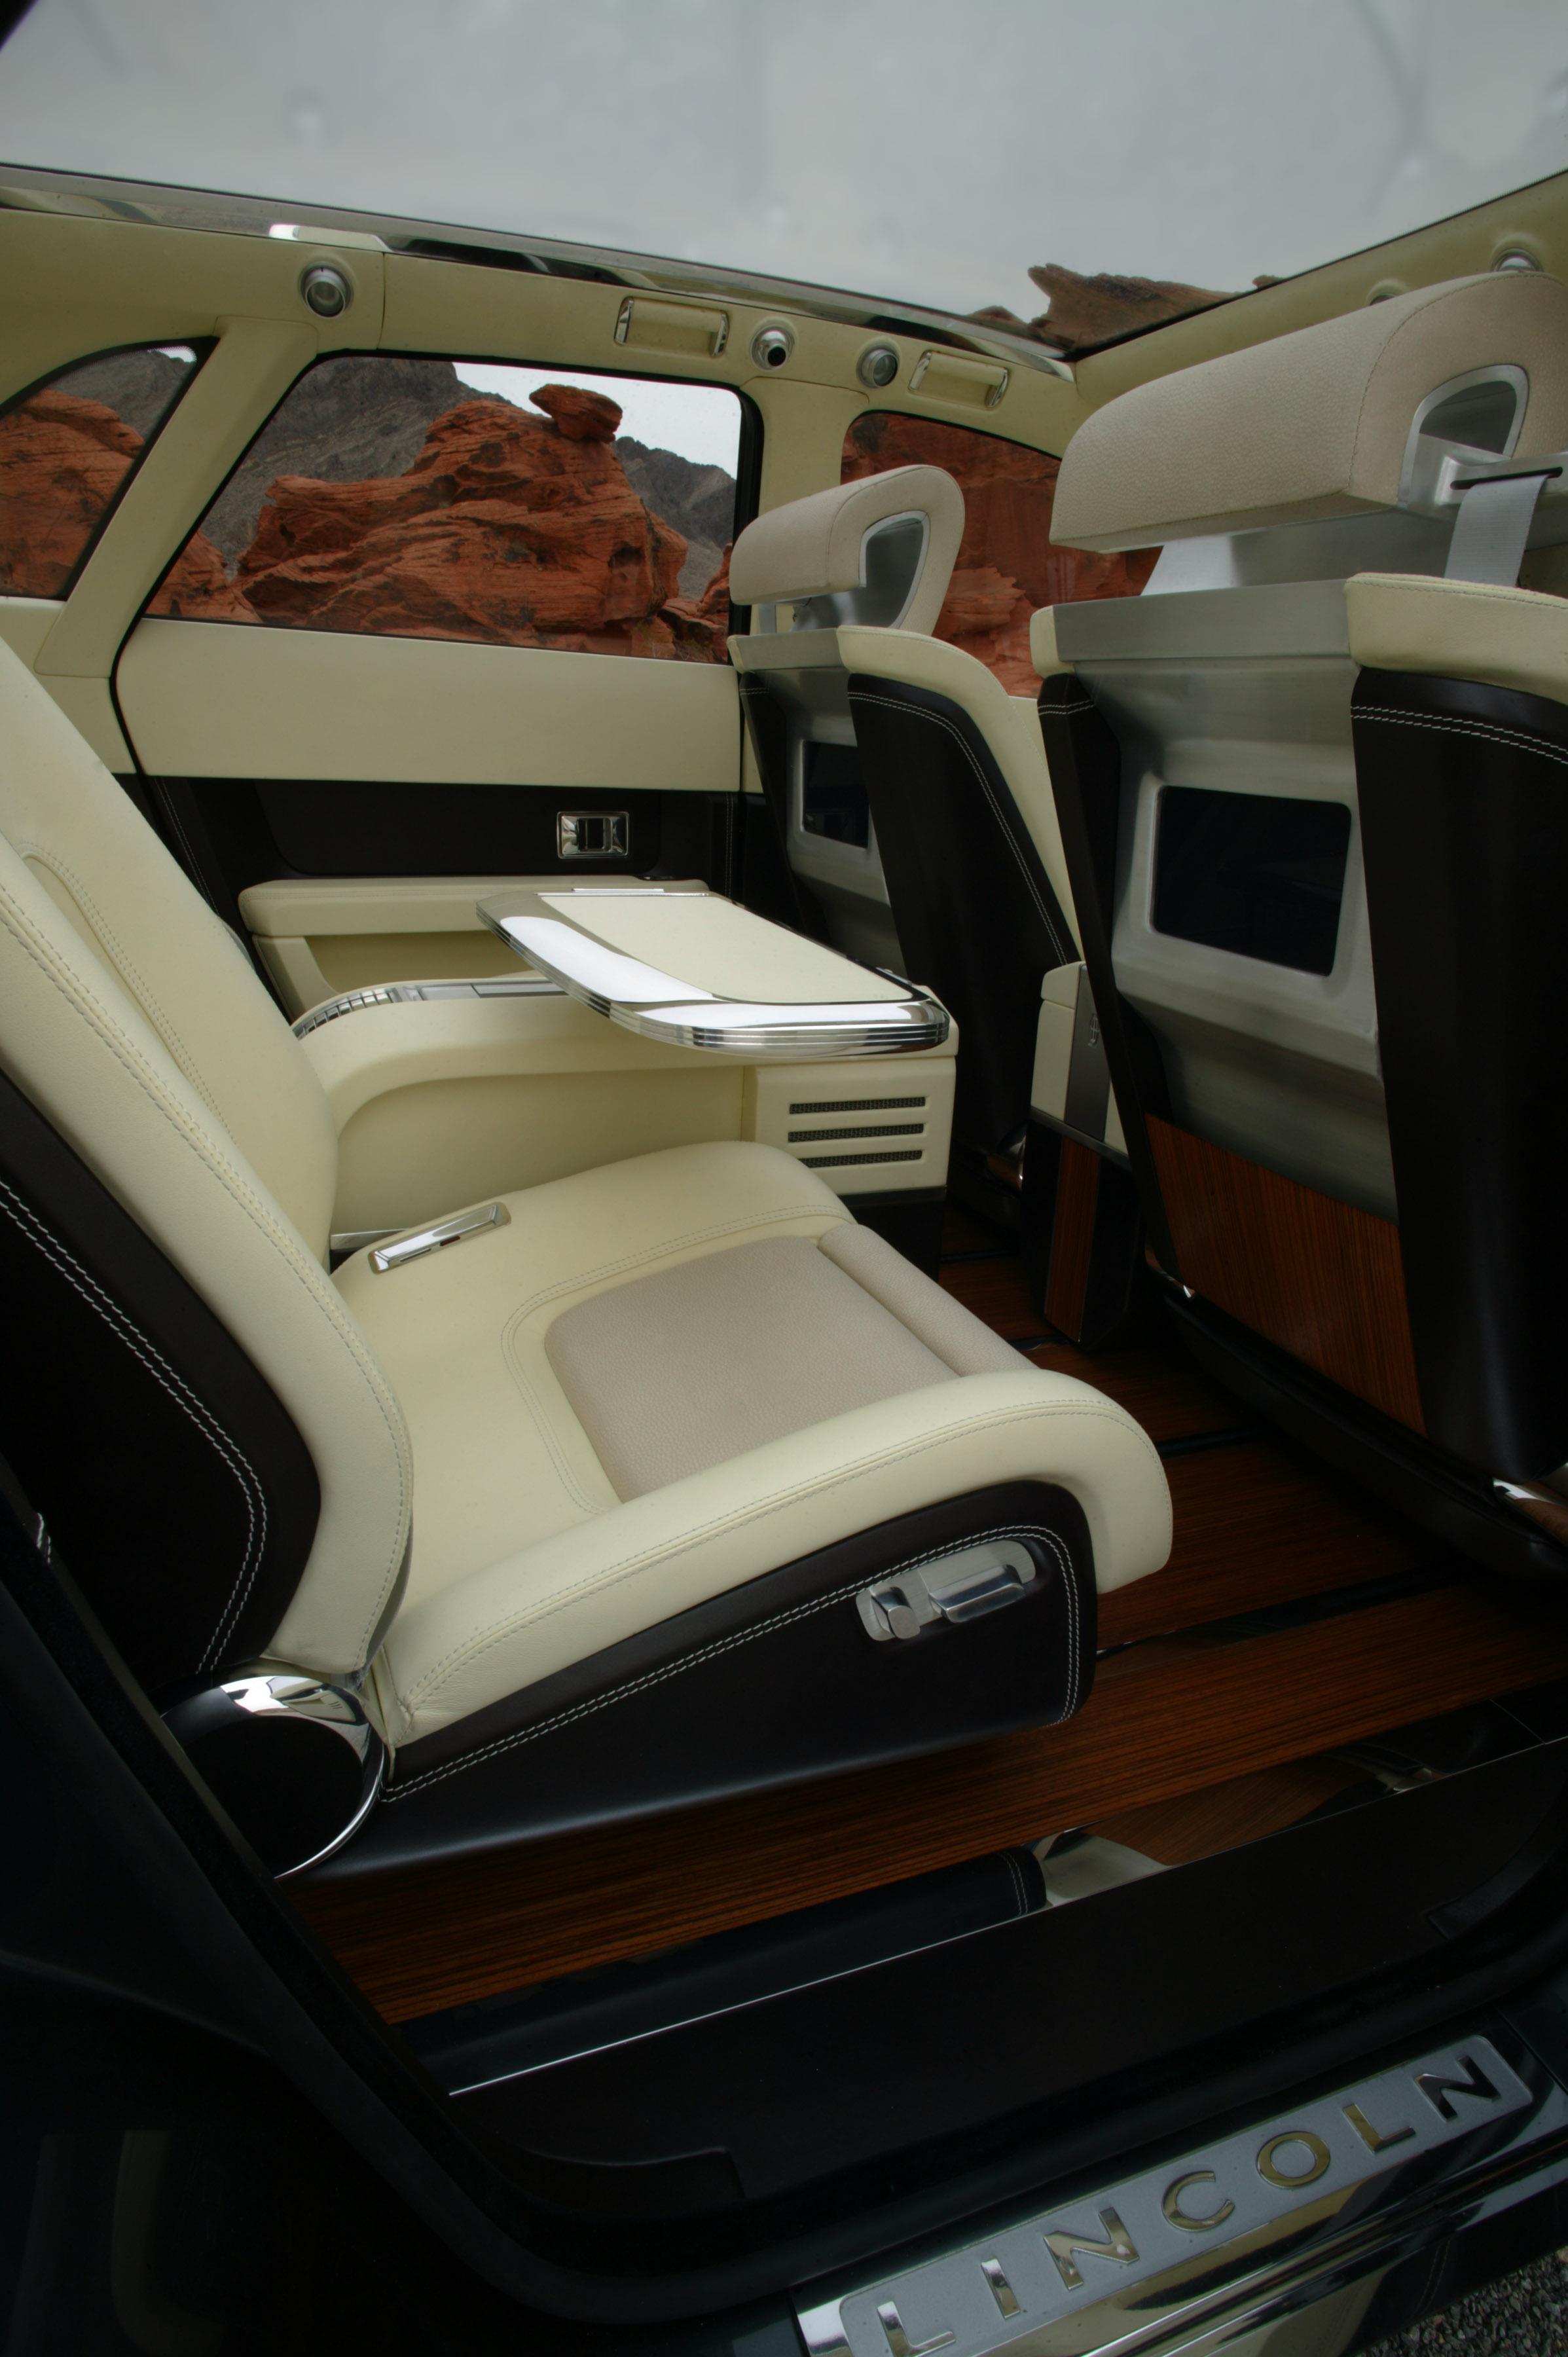 https://www.automobilesreview.com/gallery/lincoln-aviator-next-generation-concept/lincoln-aviator-concept-22.jpg